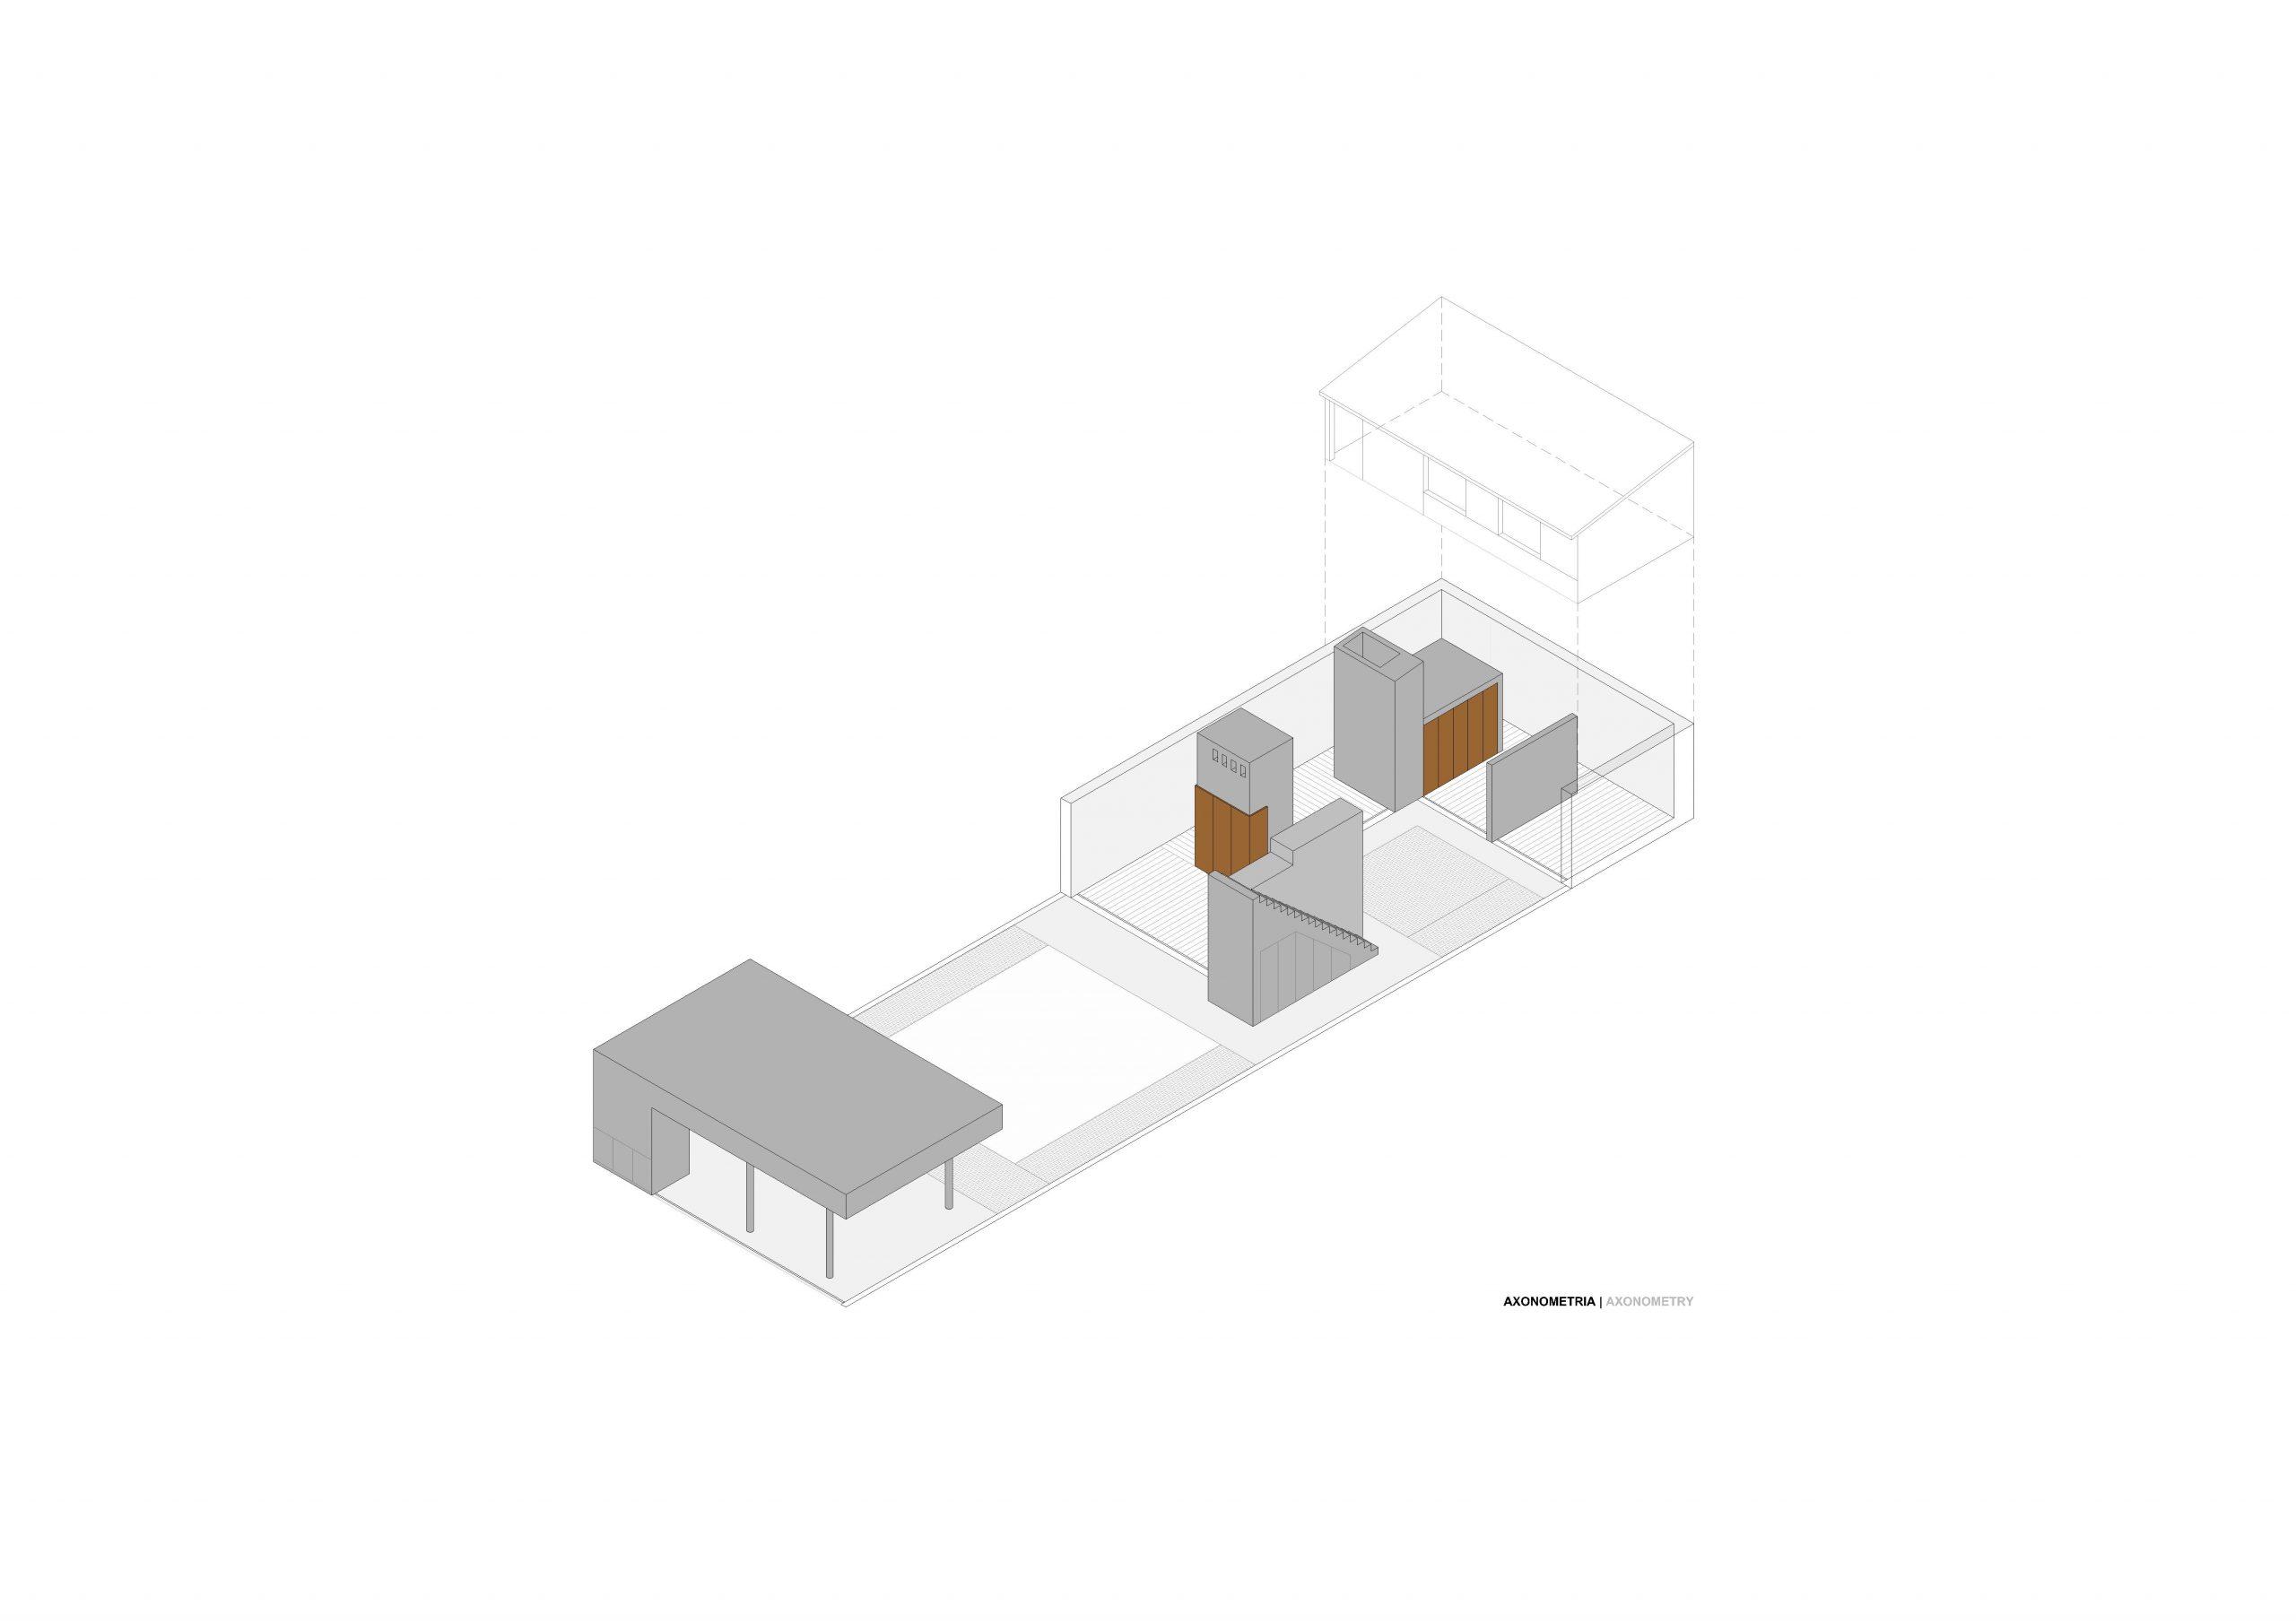 https://danielpires.com/wp-content/uploads/2020/11/04_Axonometria-scaled.jpg